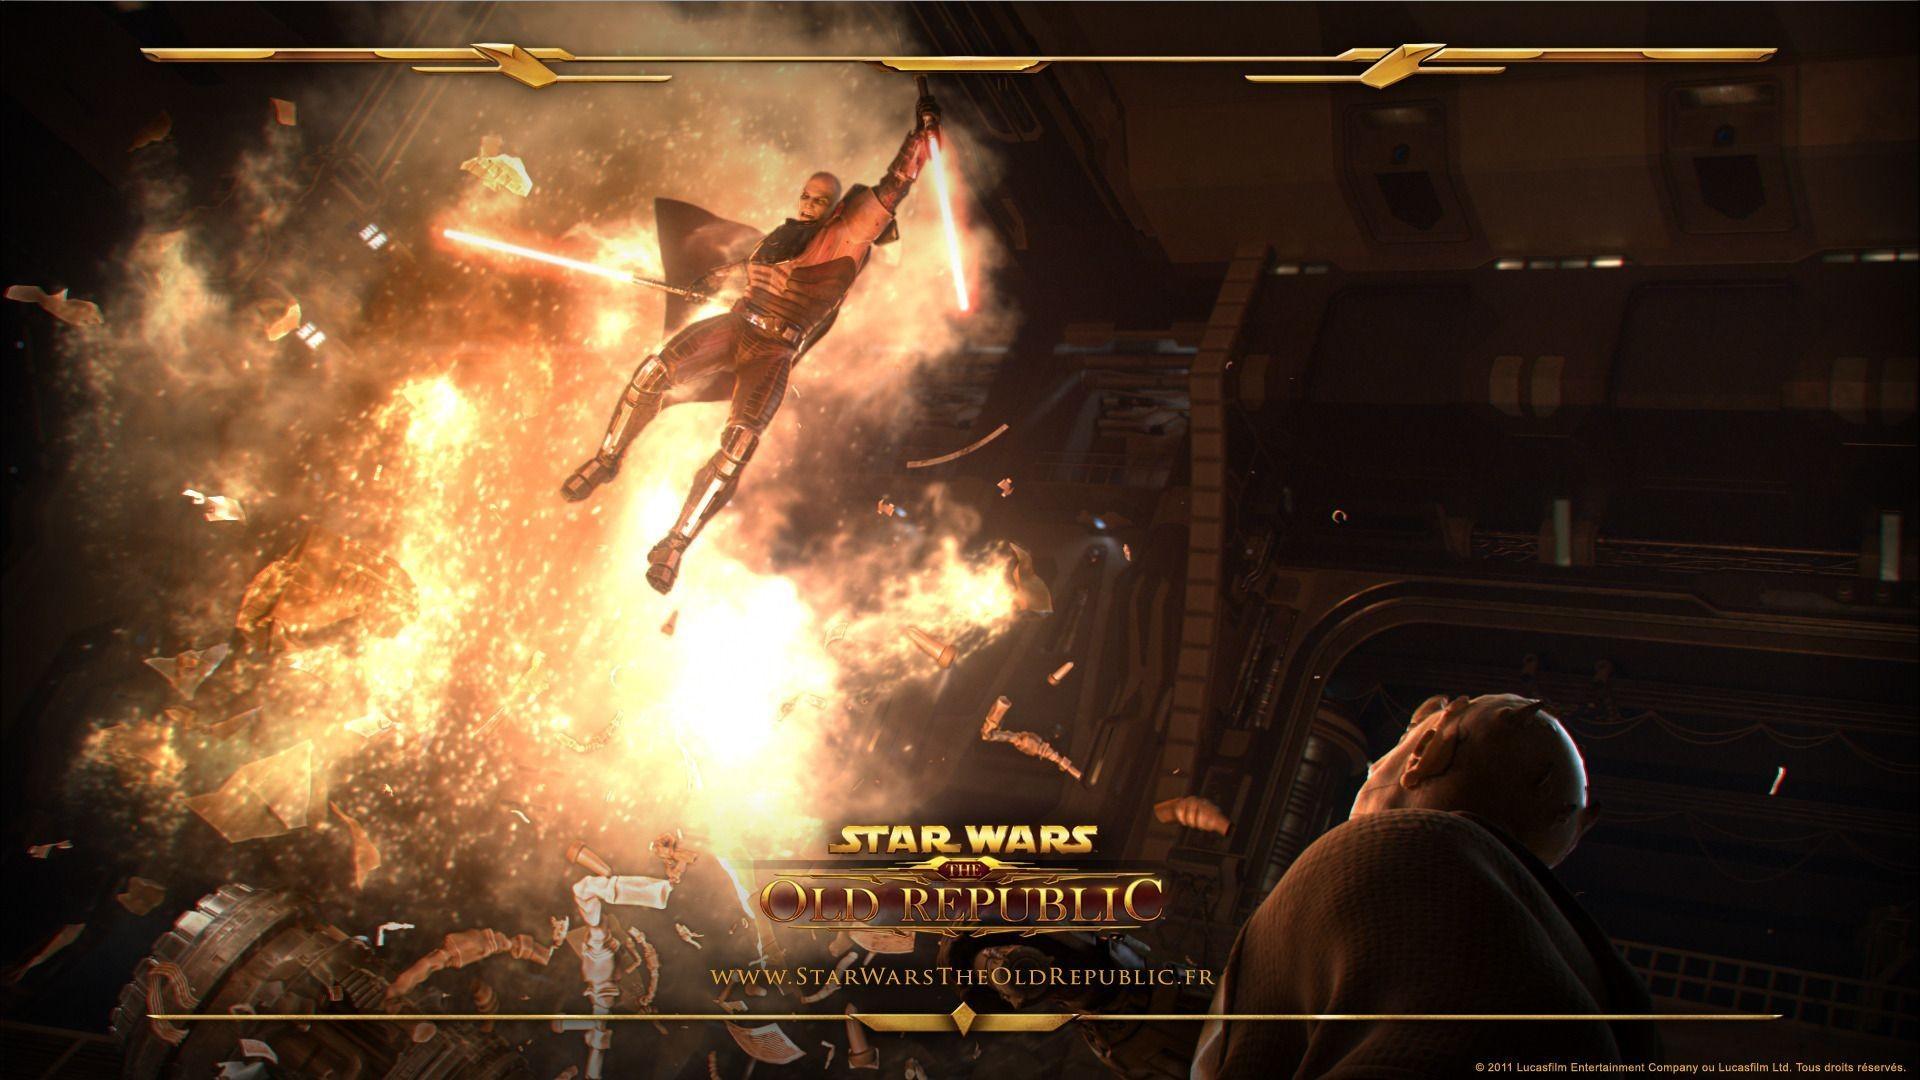 Star wars: The Old Republic – Star Wars Wallpaper (26970240) – Fanpop